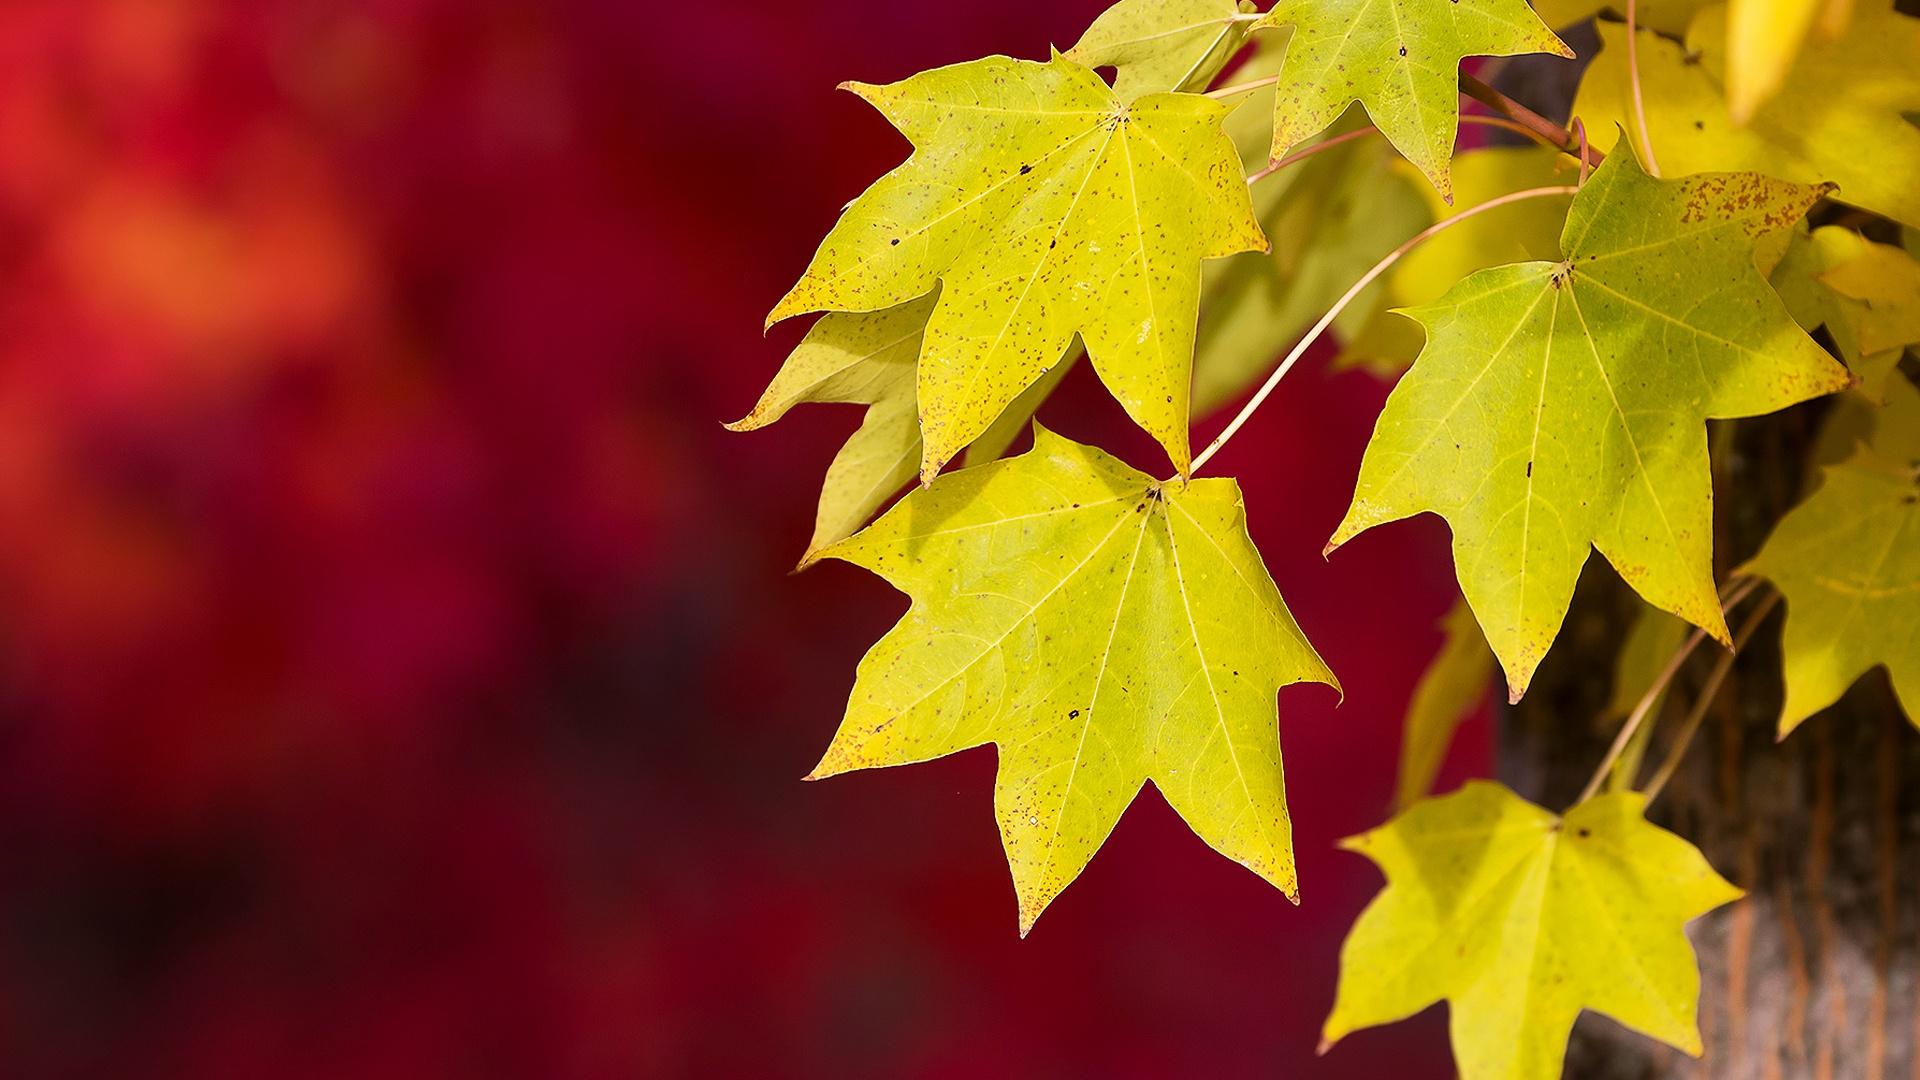 Ears of Corn Grain Wheat Leaves Yellow Autumn